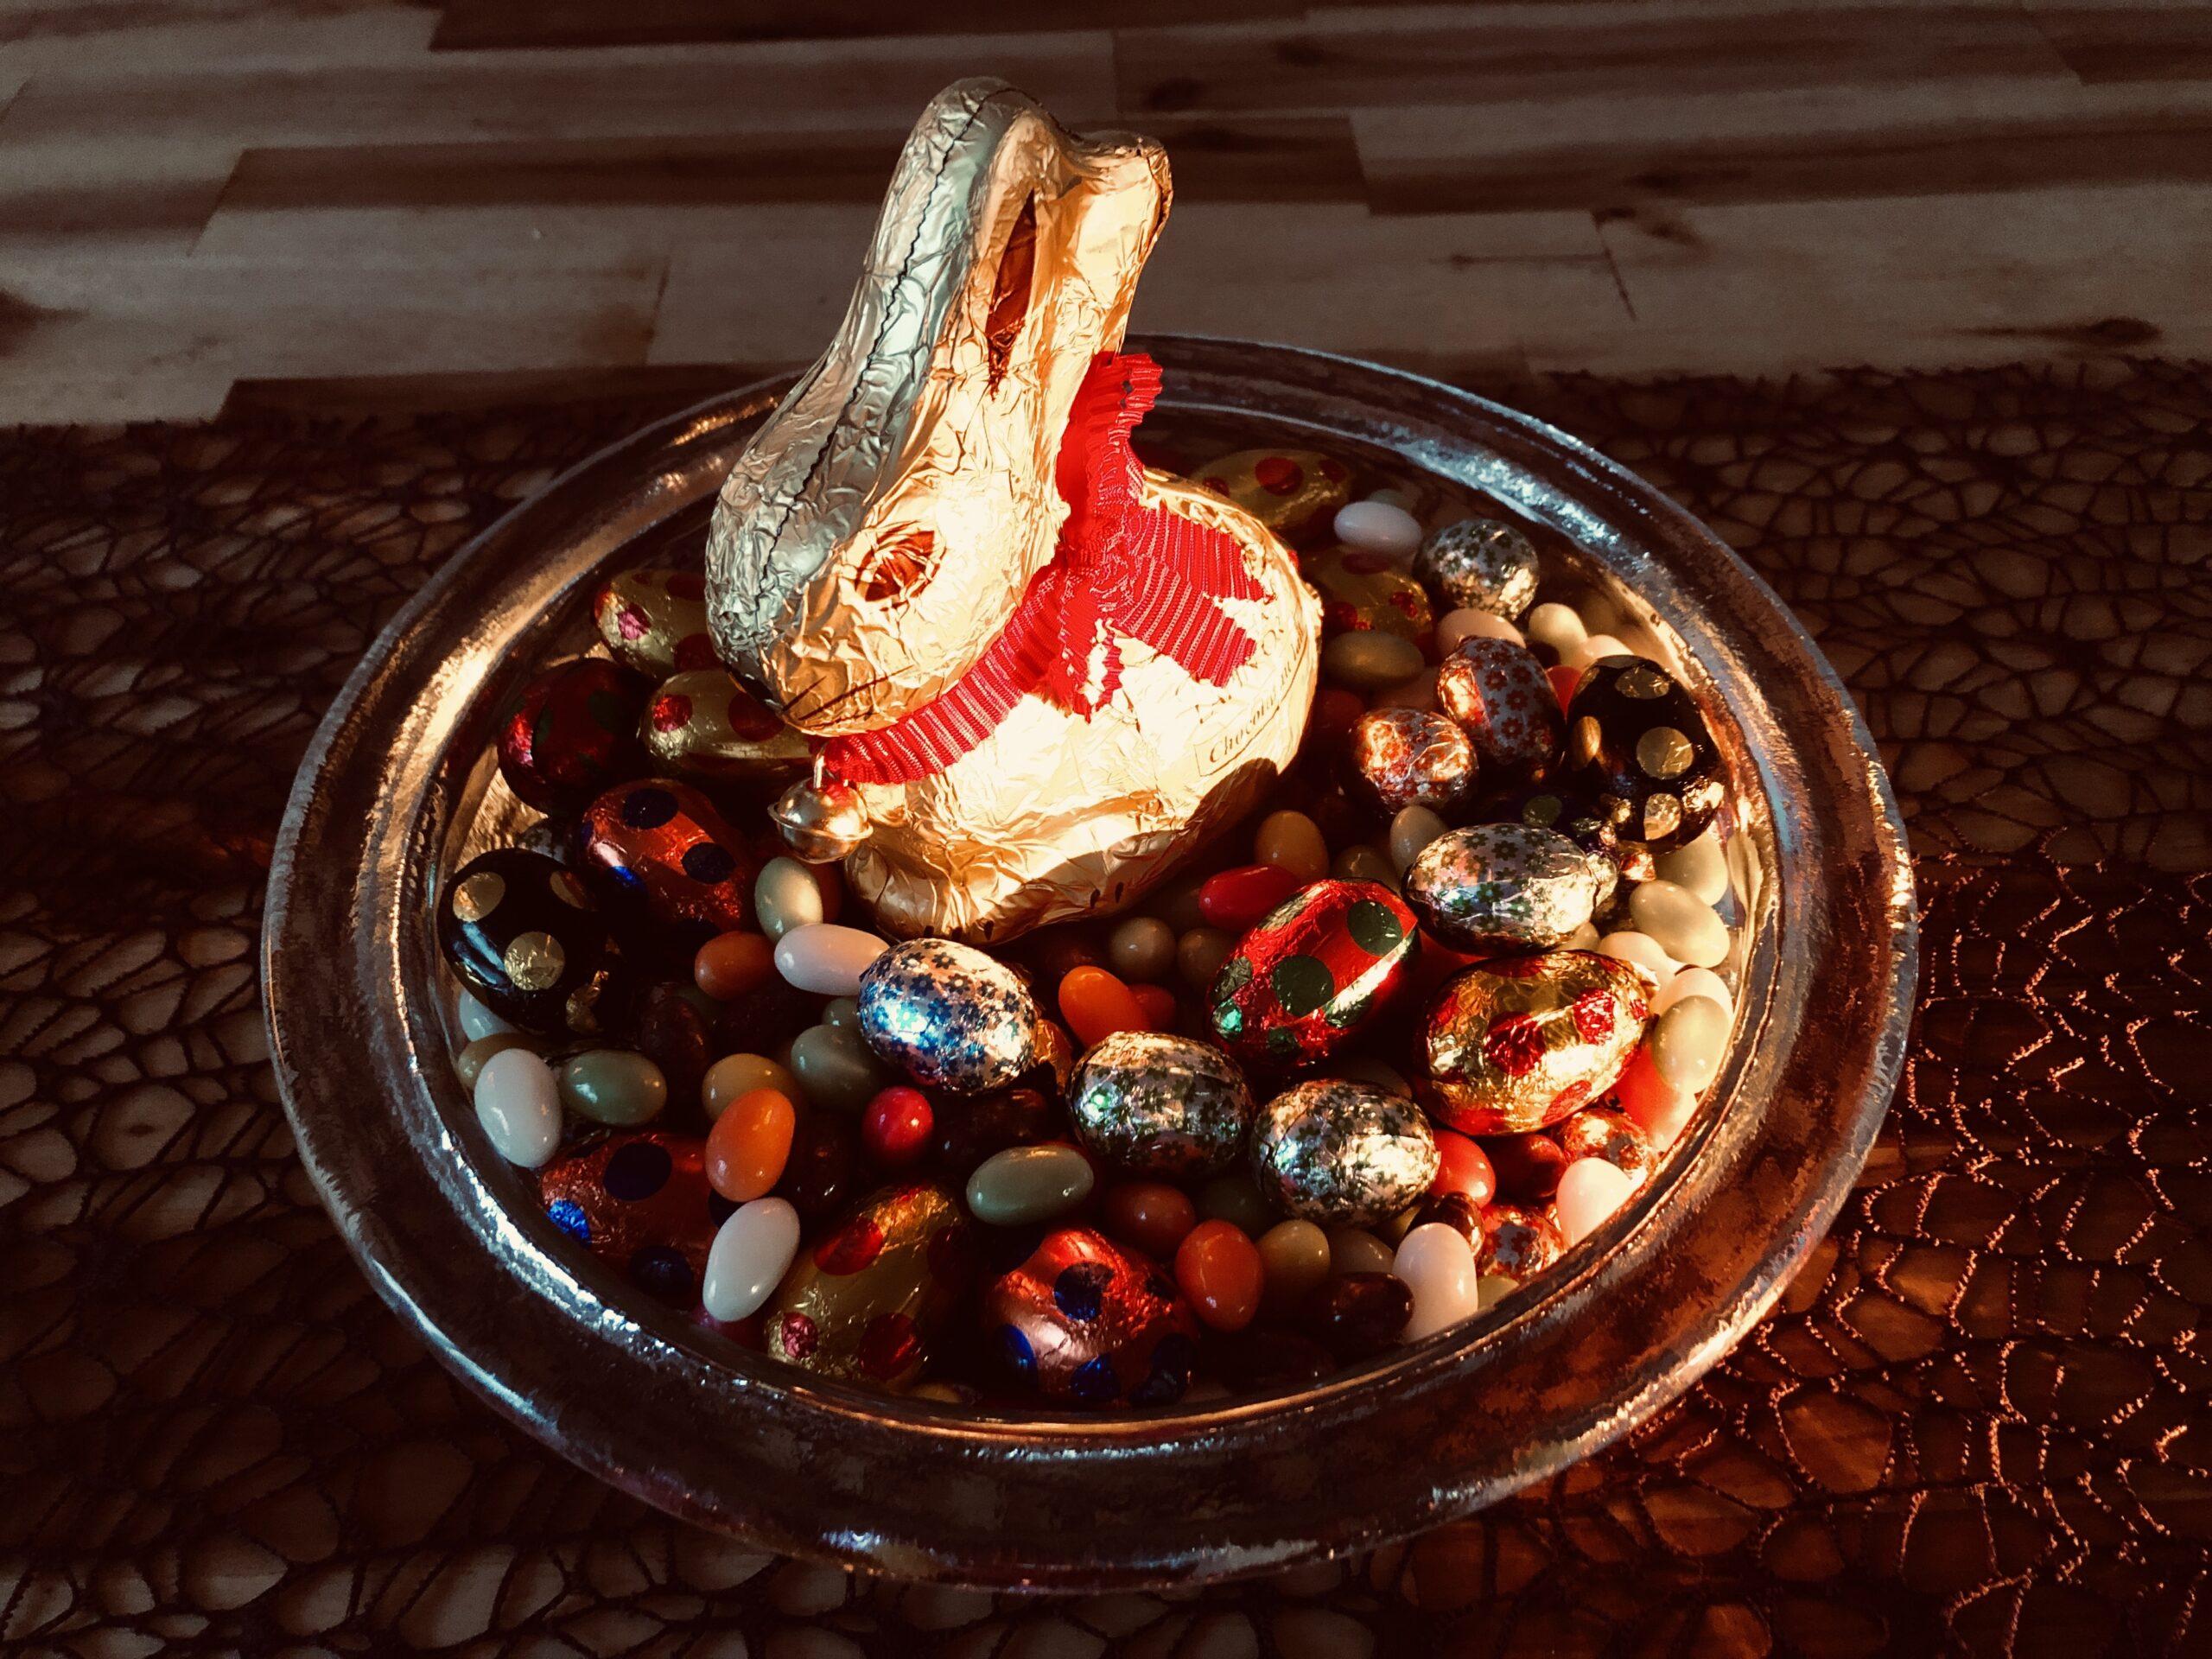 easterbunny in Eastereggs #stayathome #bleibdaheim